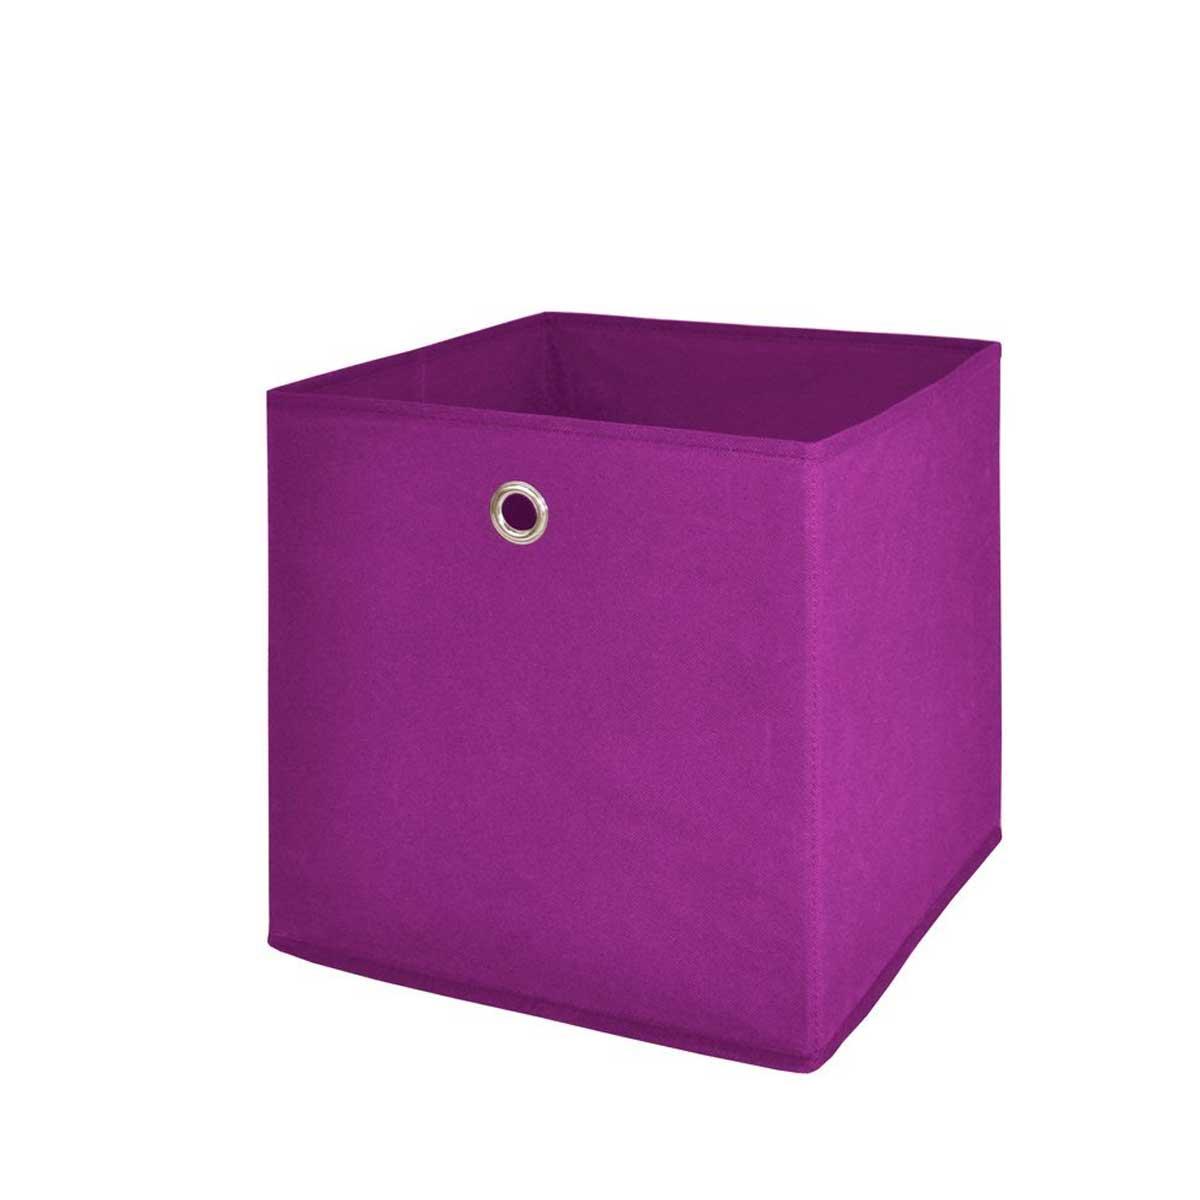 faltbox flori 2 korb regal aufbewahrungsbox box 24x24x24 cm lila ebay. Black Bedroom Furniture Sets. Home Design Ideas